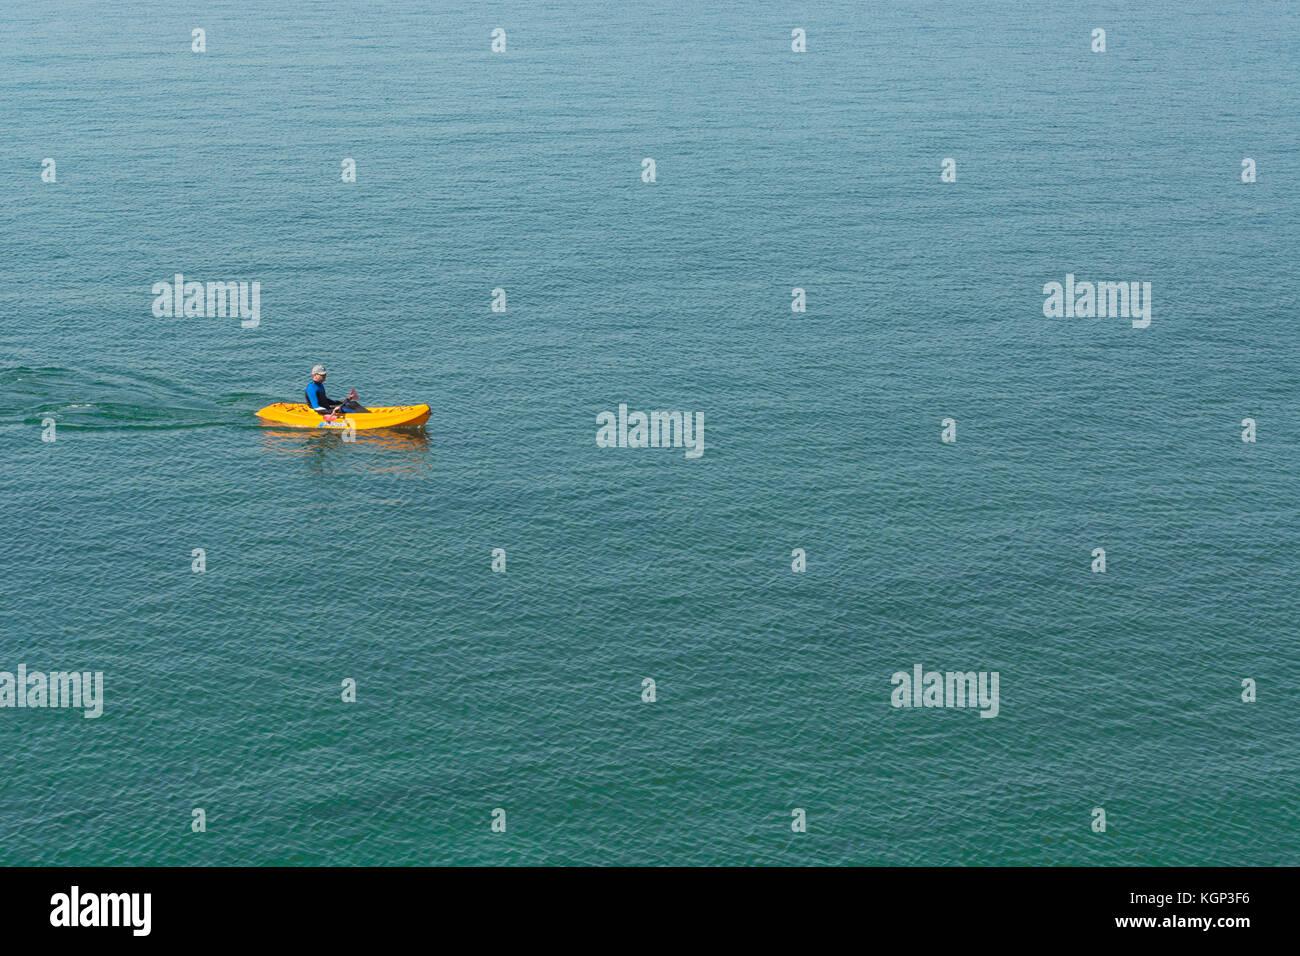 Canoeist paddling a yellow sea kayak in Cornwall. - Stock Image